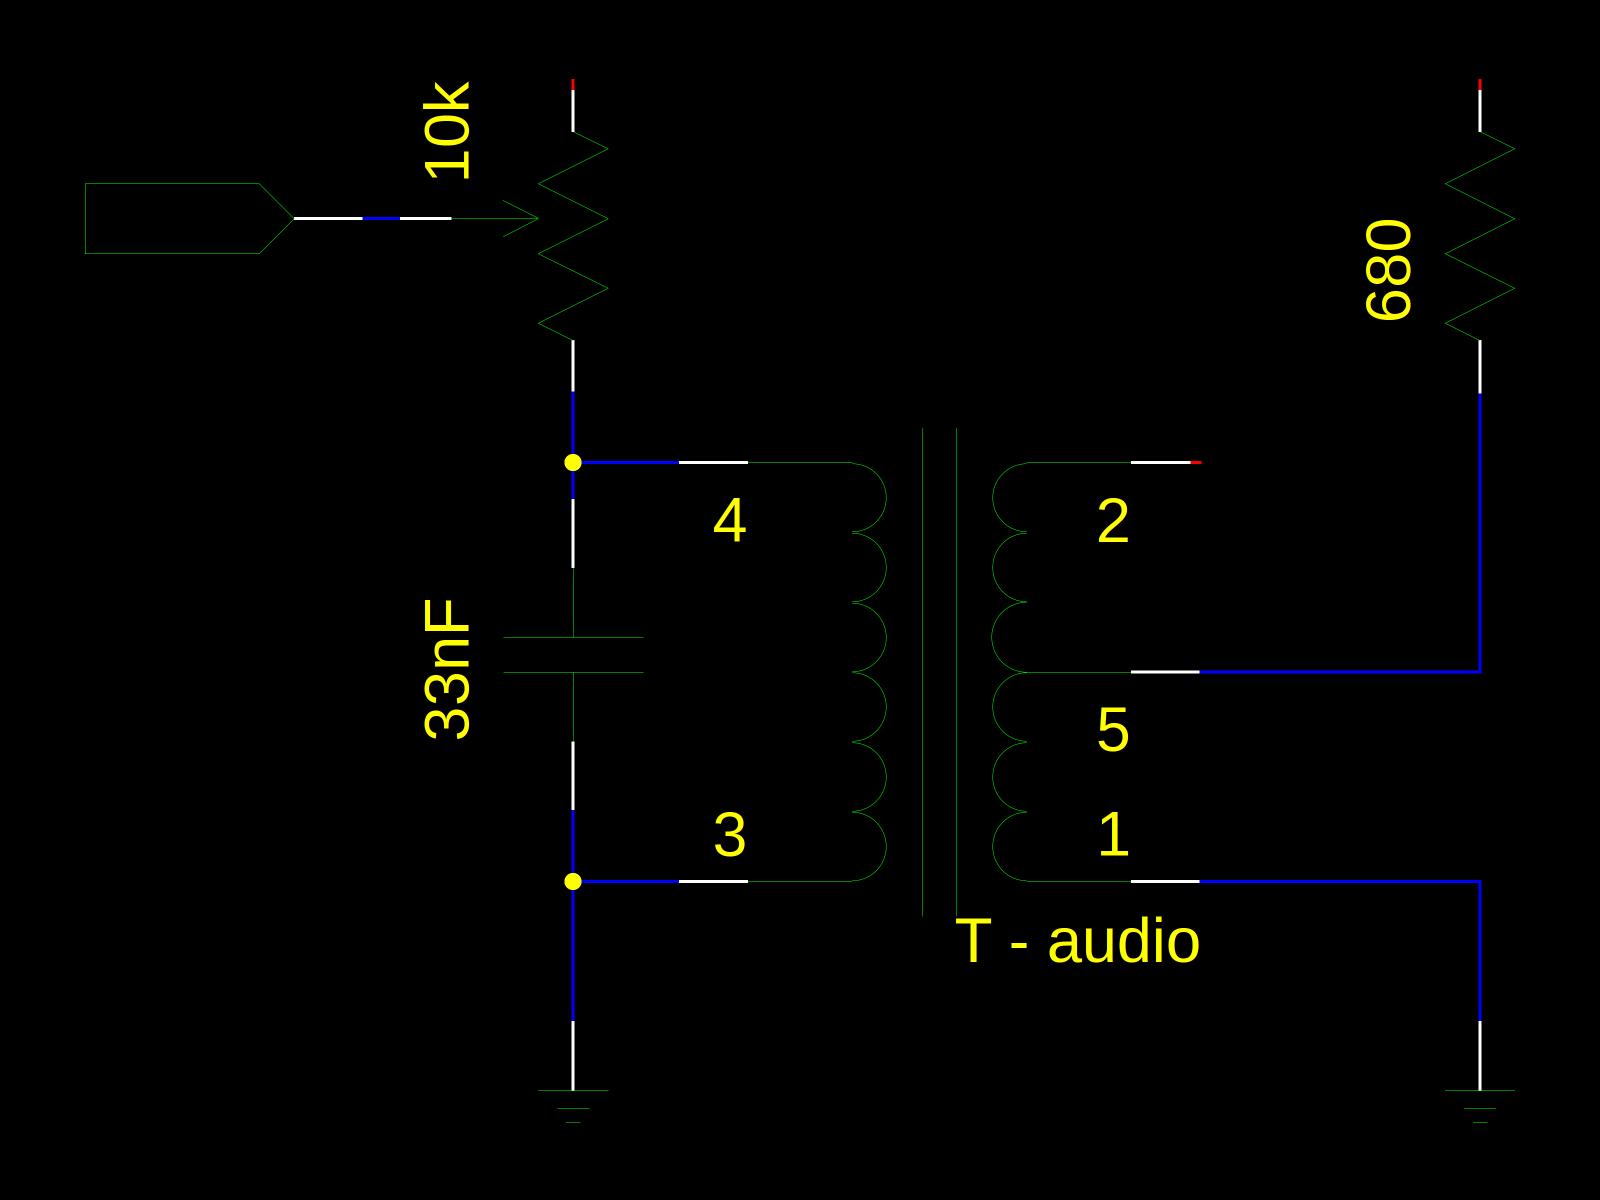 Blog De Vk5hse 2012 Filehardware Block Diagram 1 8jpg Hpsdrwiki Heres The Circuit